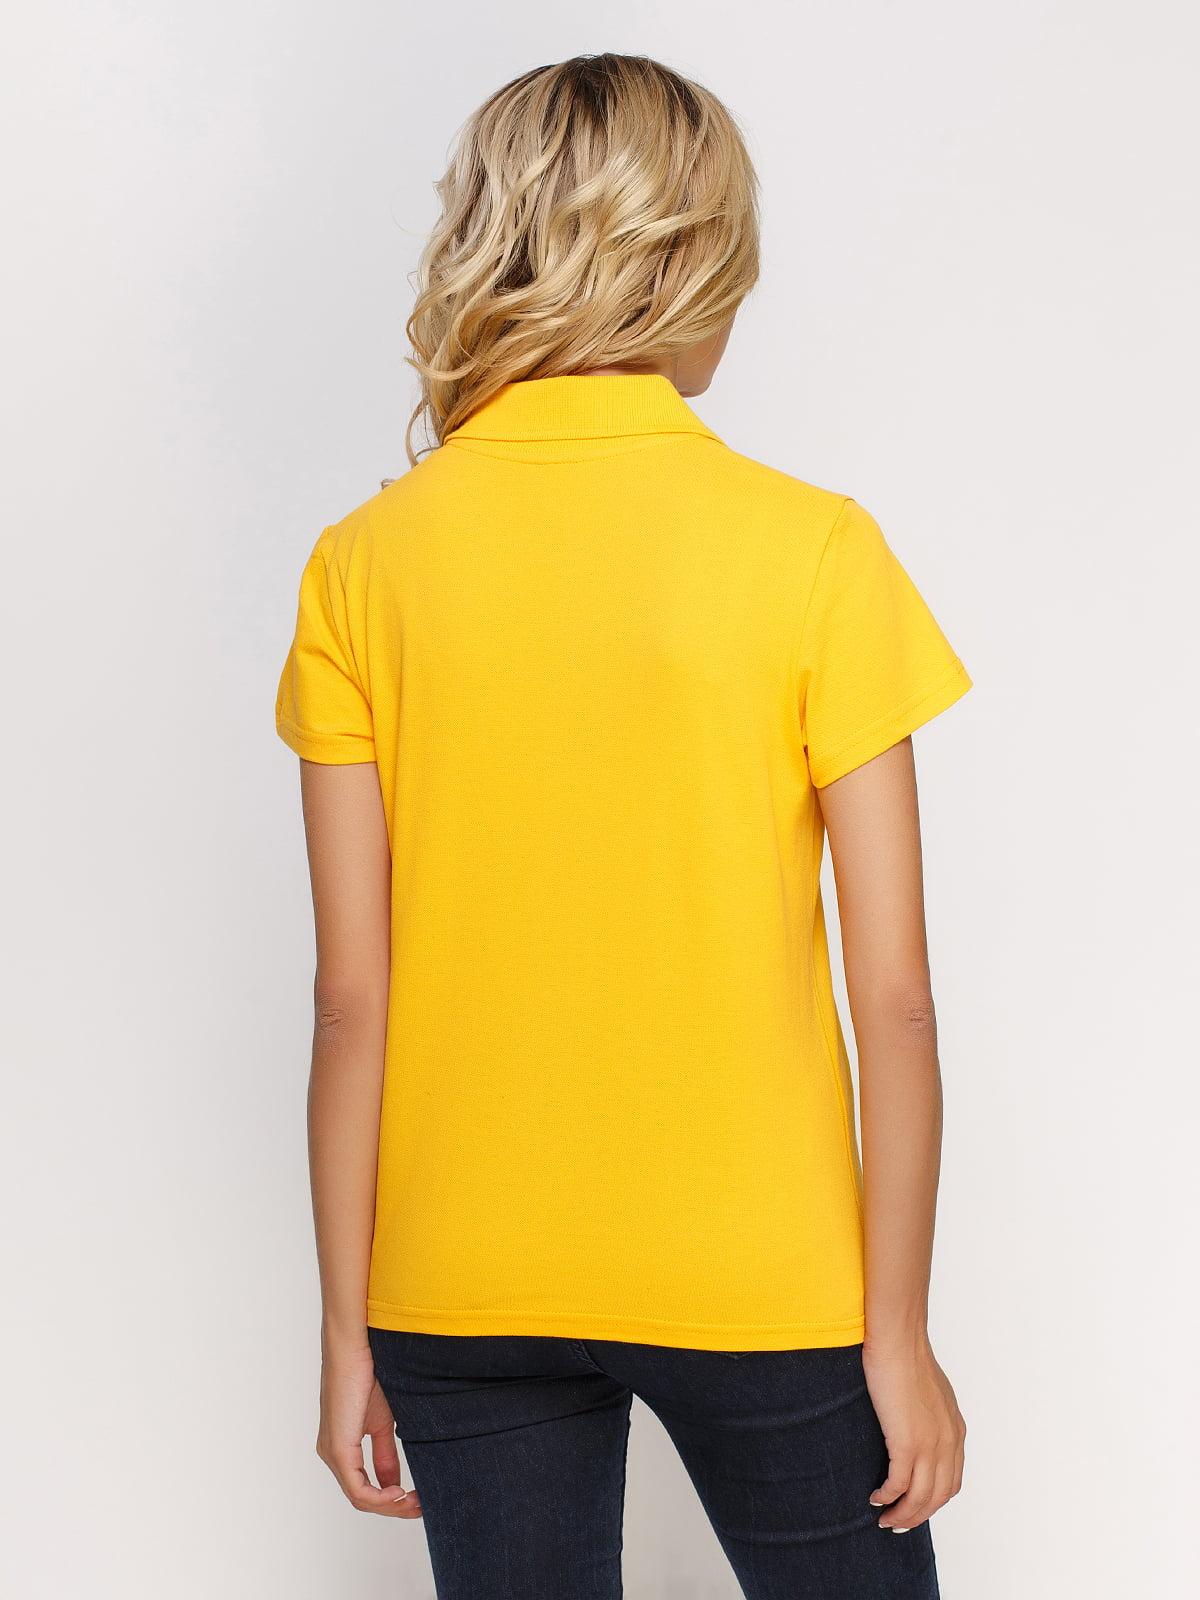 Футболка-поло жовта з принтом | 4578610 | фото 2